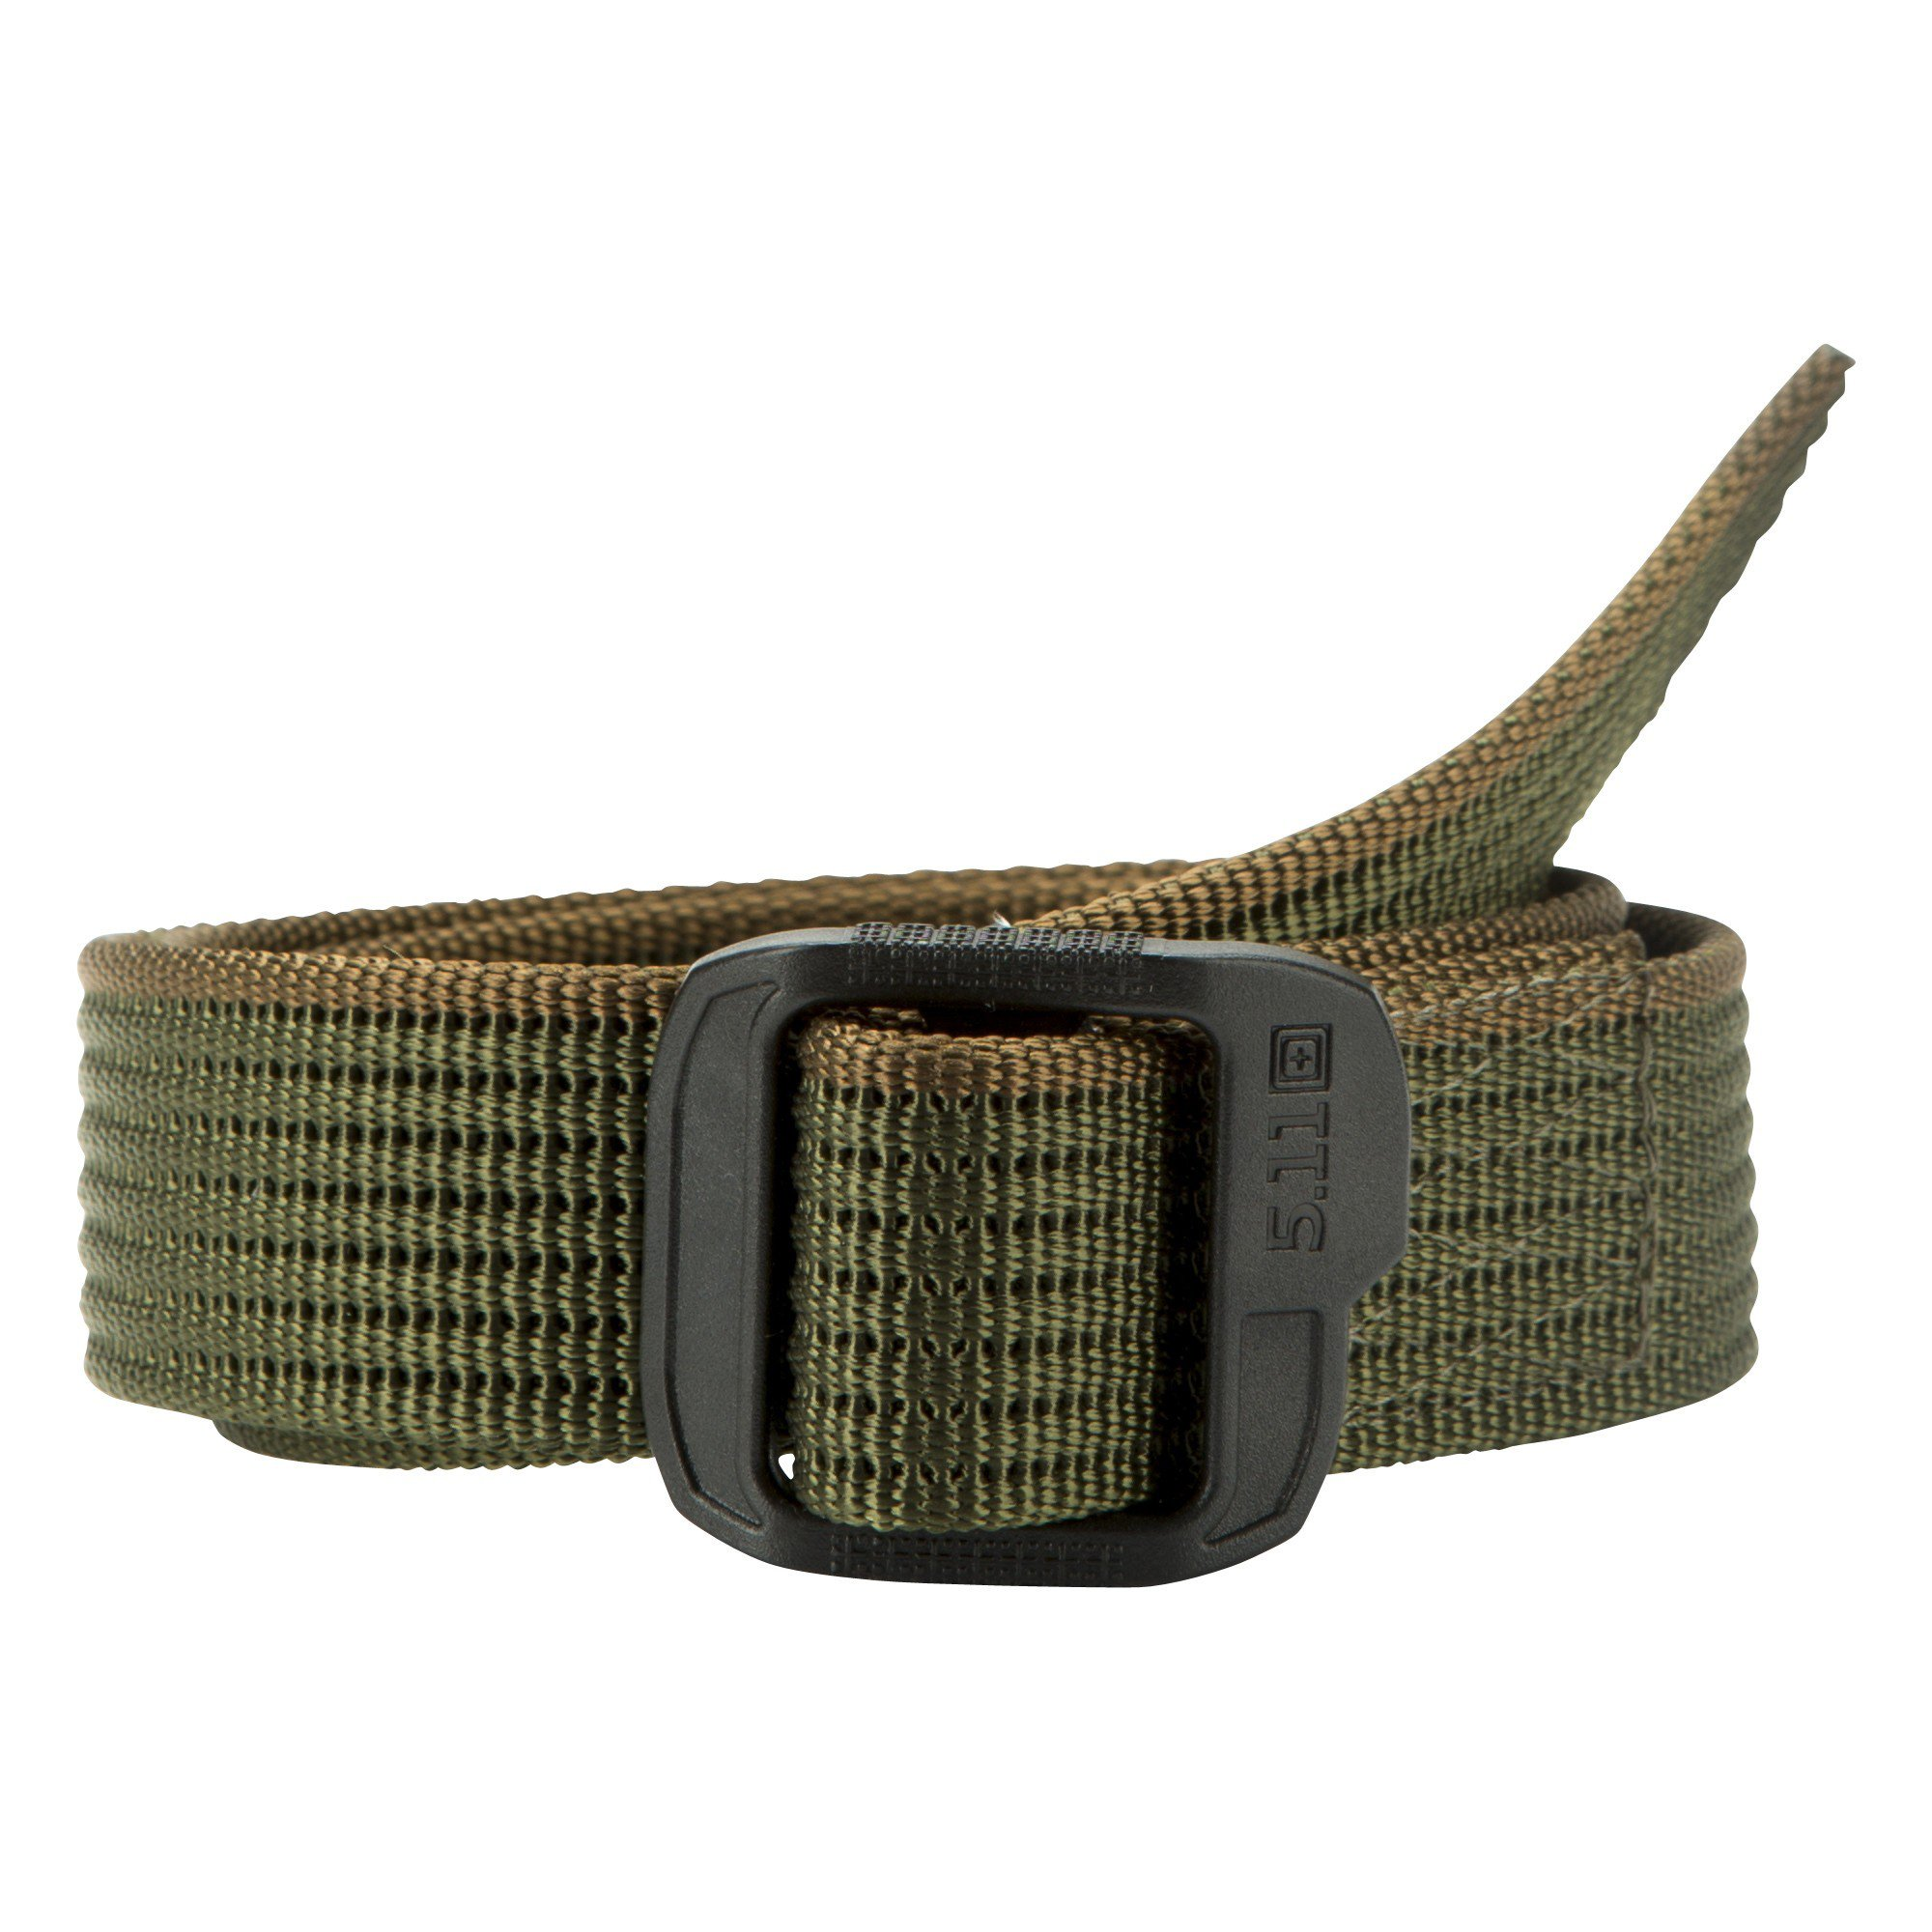 5.11 Women's 1.25'' Kella Tactical Belt, Style 59529, Swamp, S